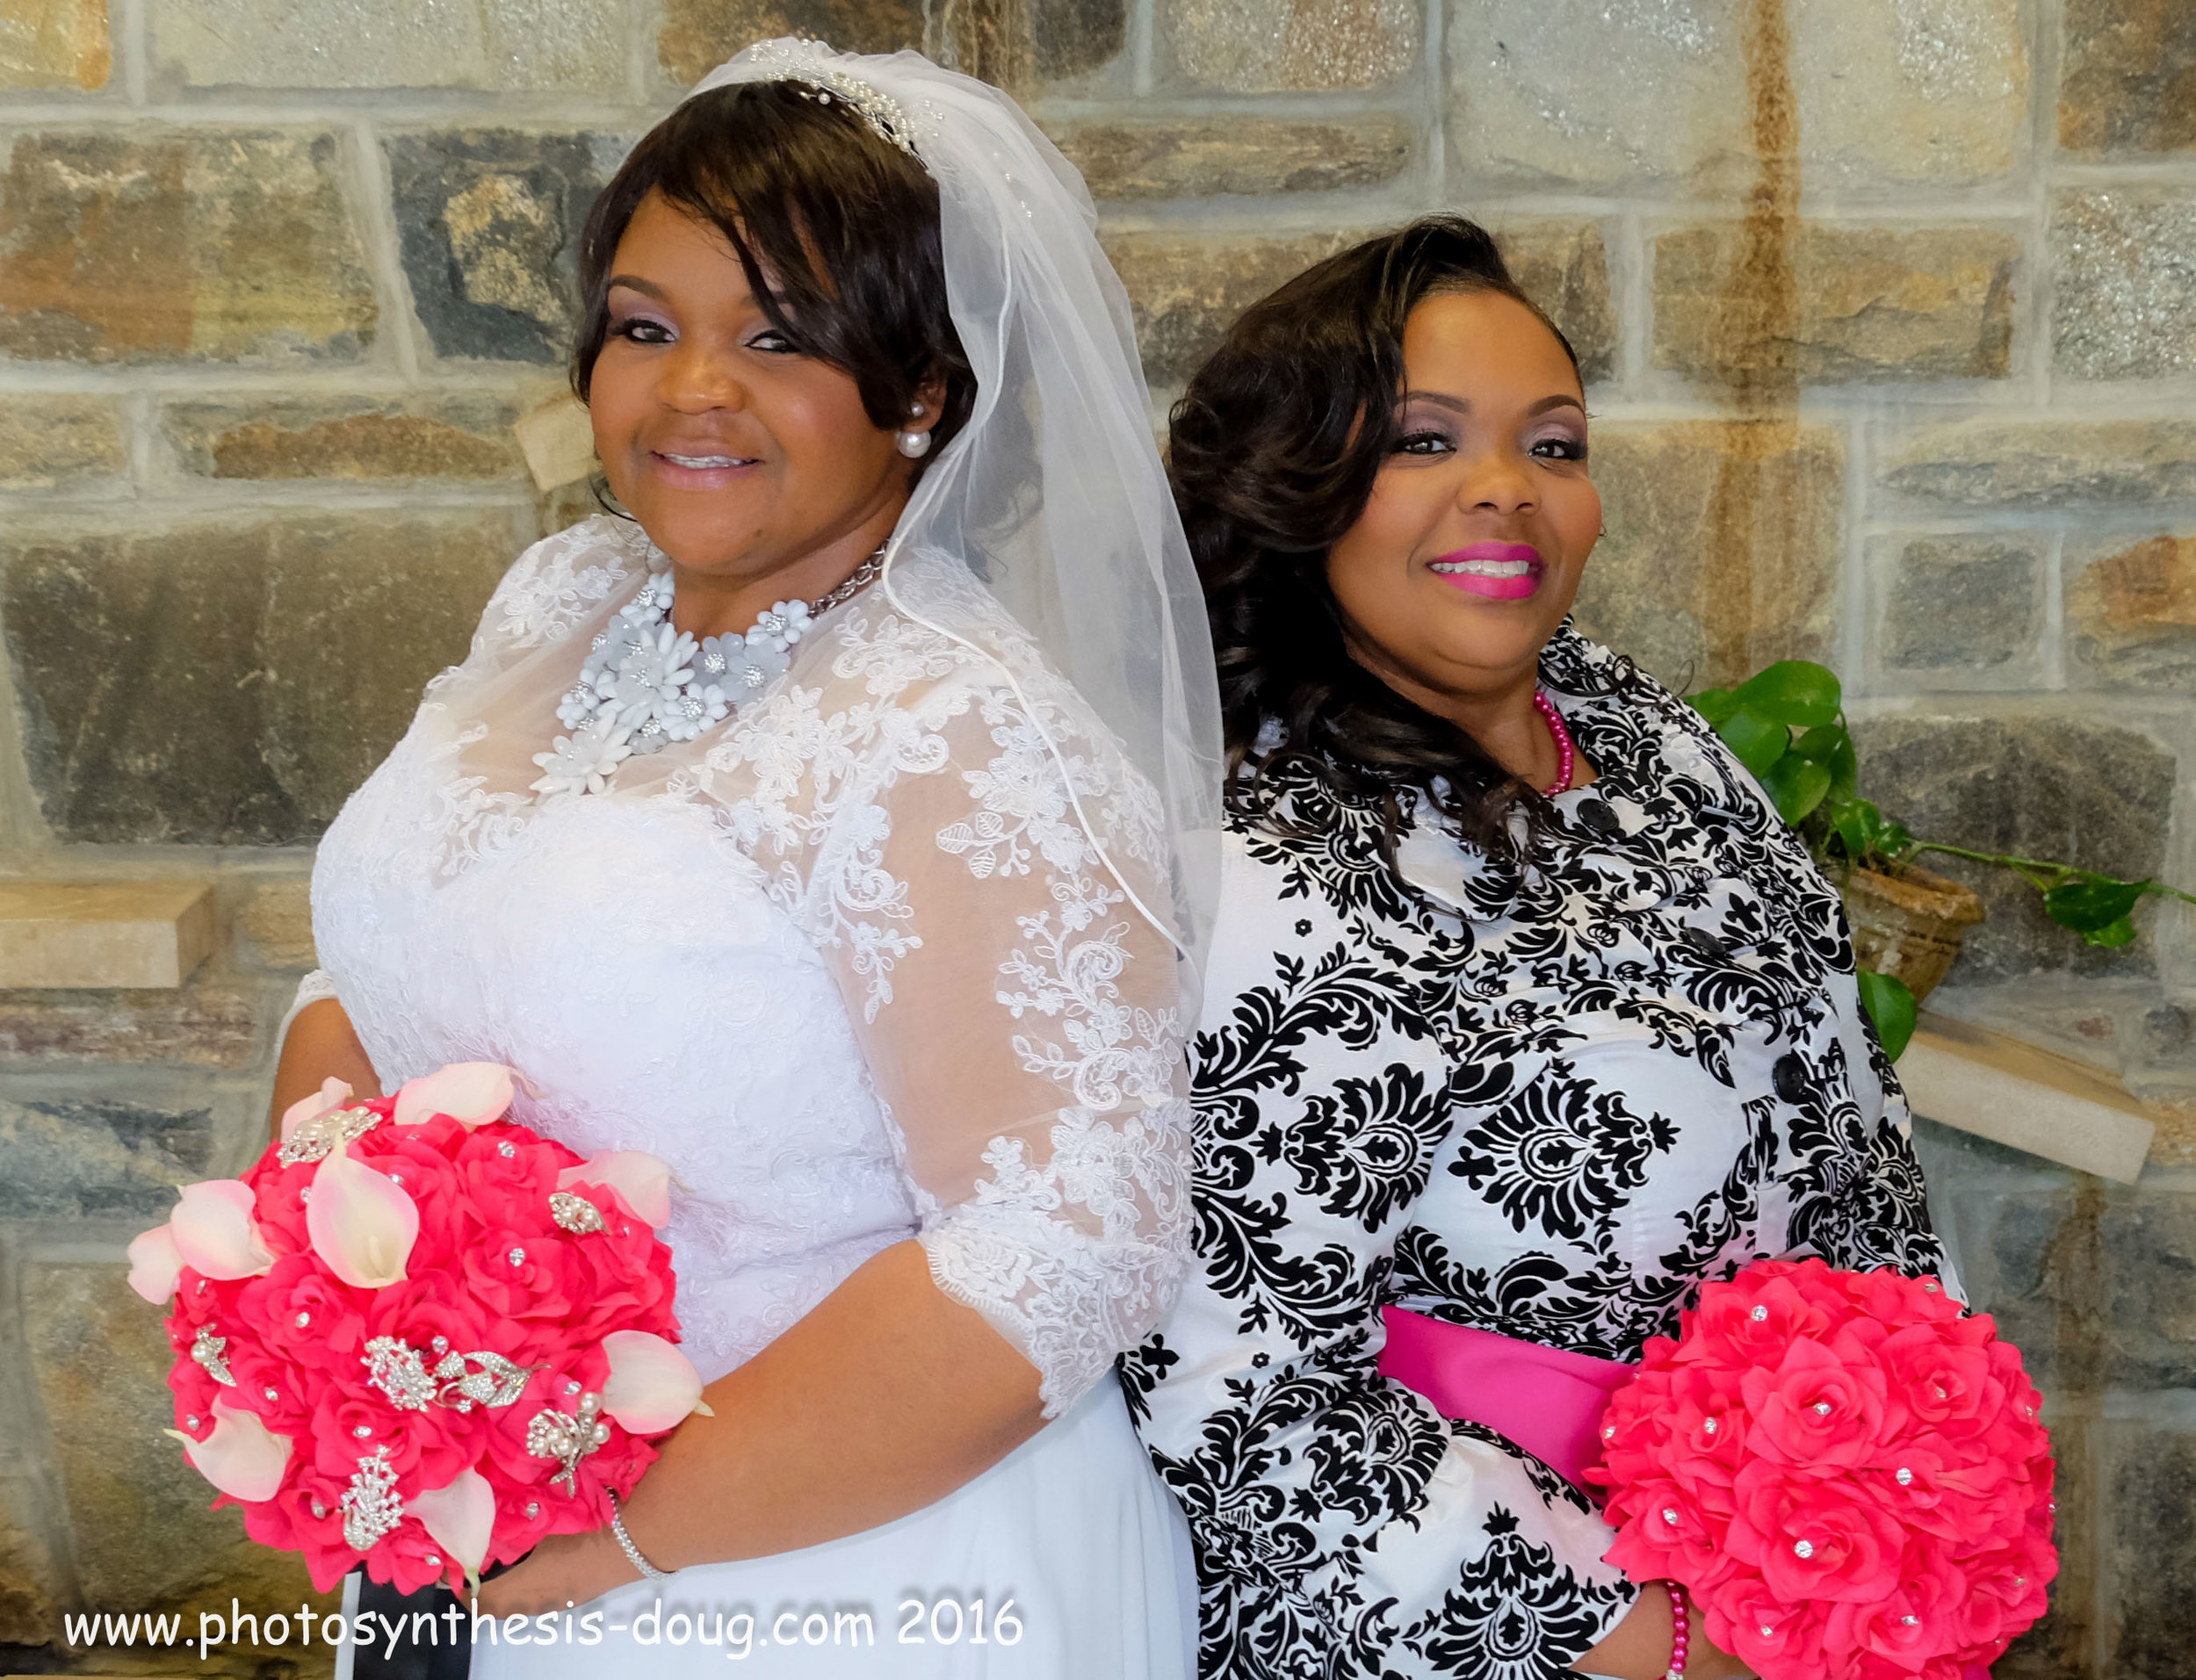 Brides by Doug-9541.jpg